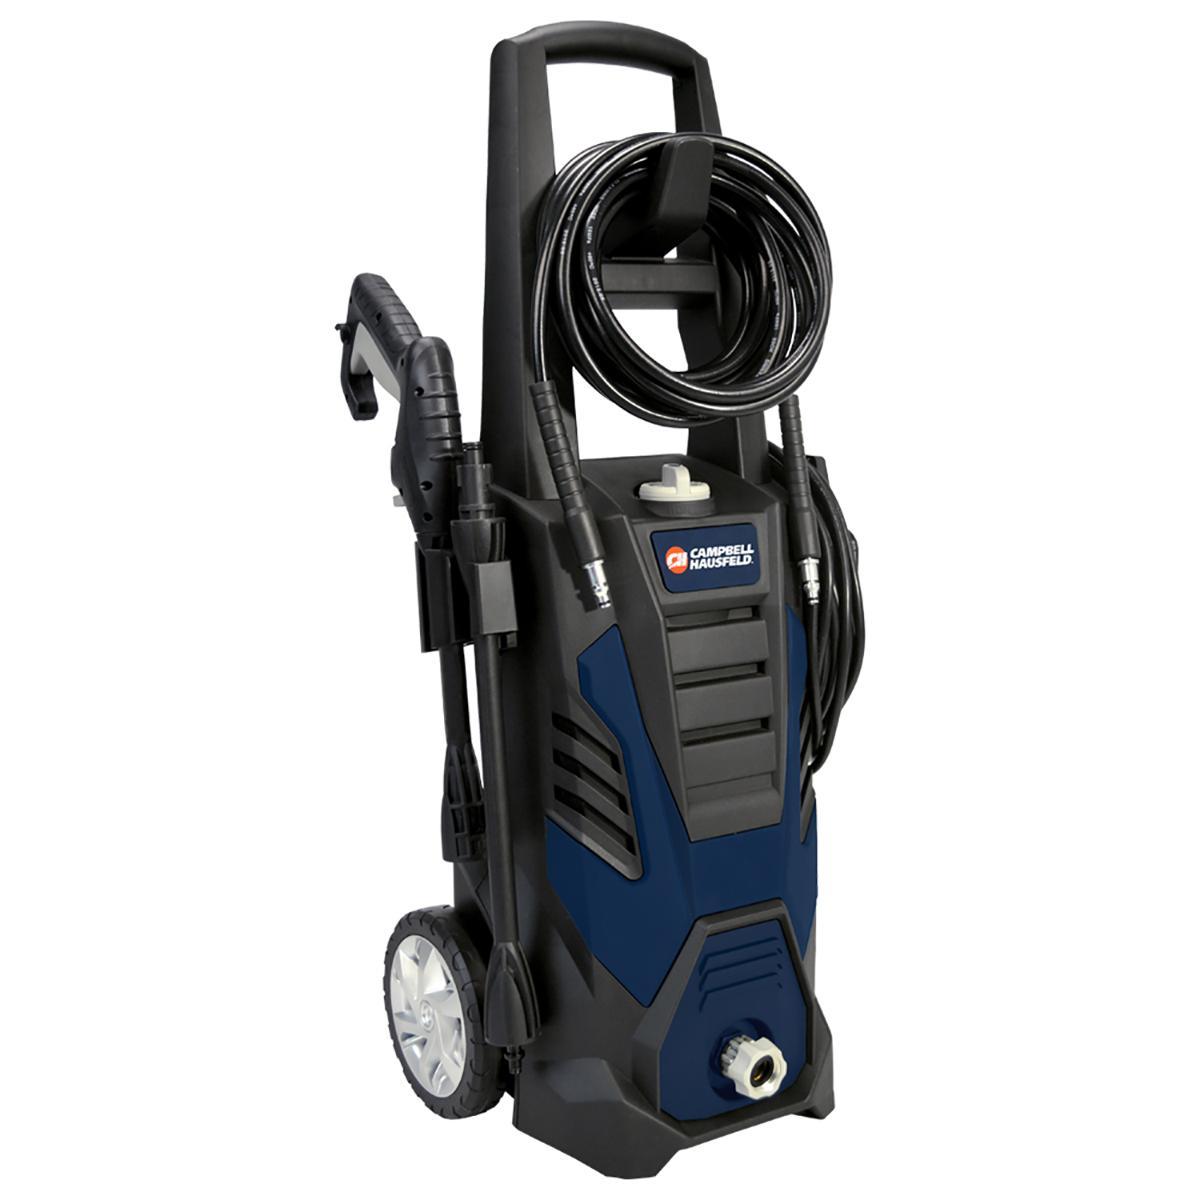 Ryobi 2000 psi pressure washer manual